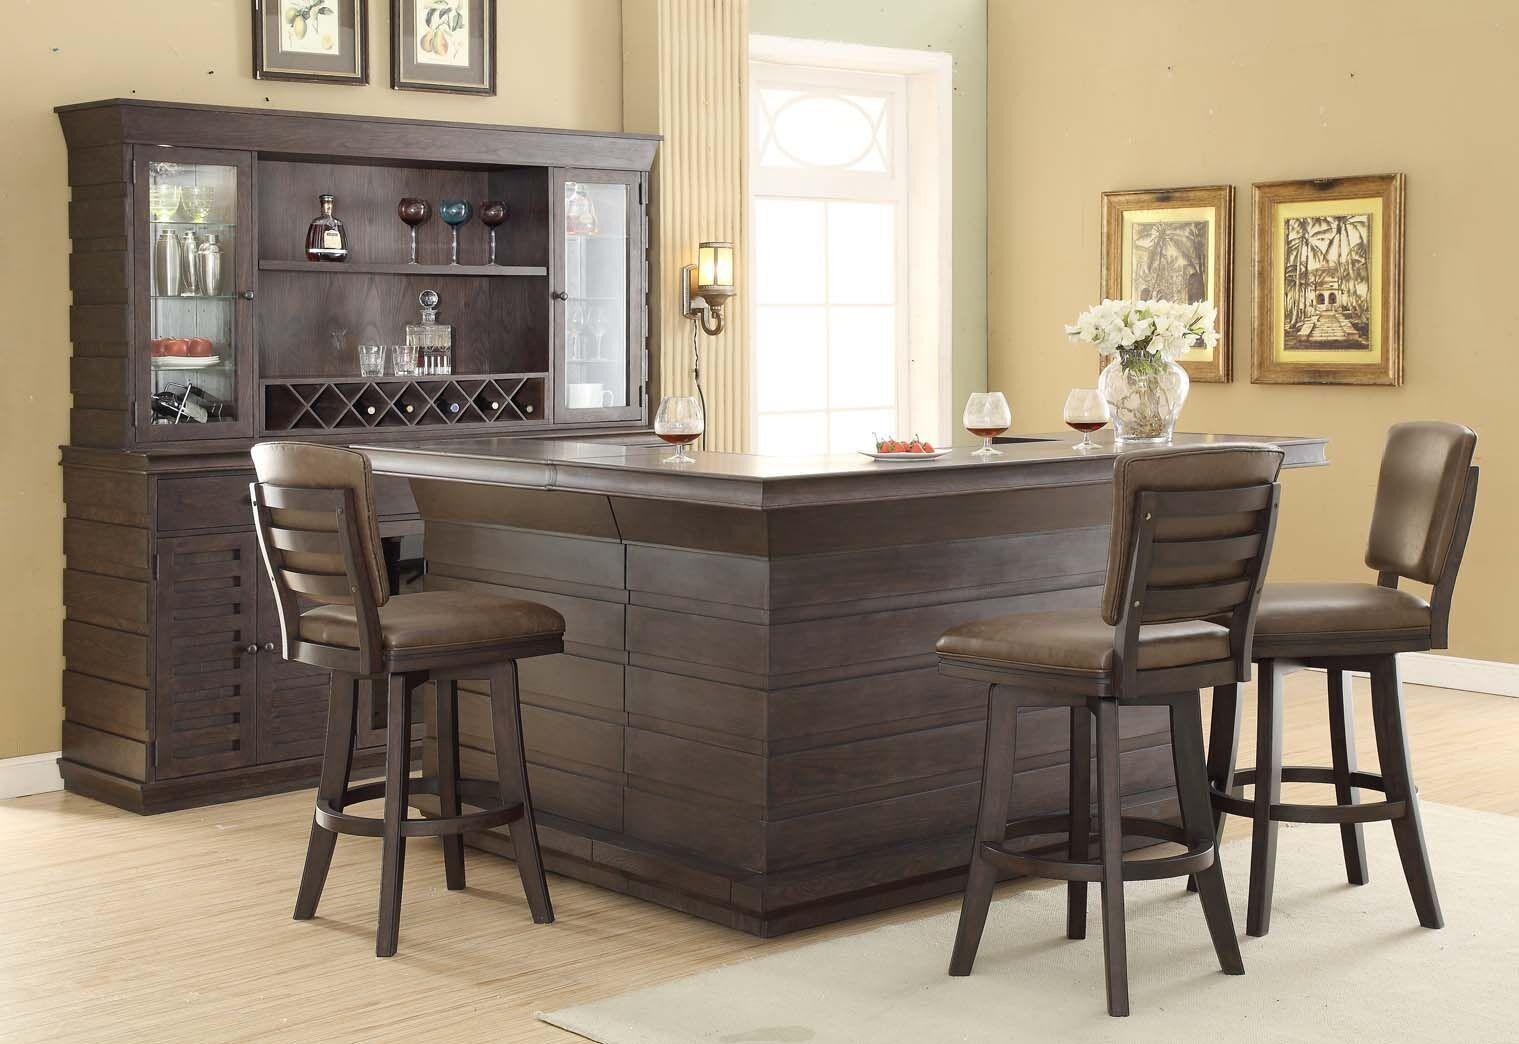 ECI Furniture Toscana Distressed Birch Bar Stool